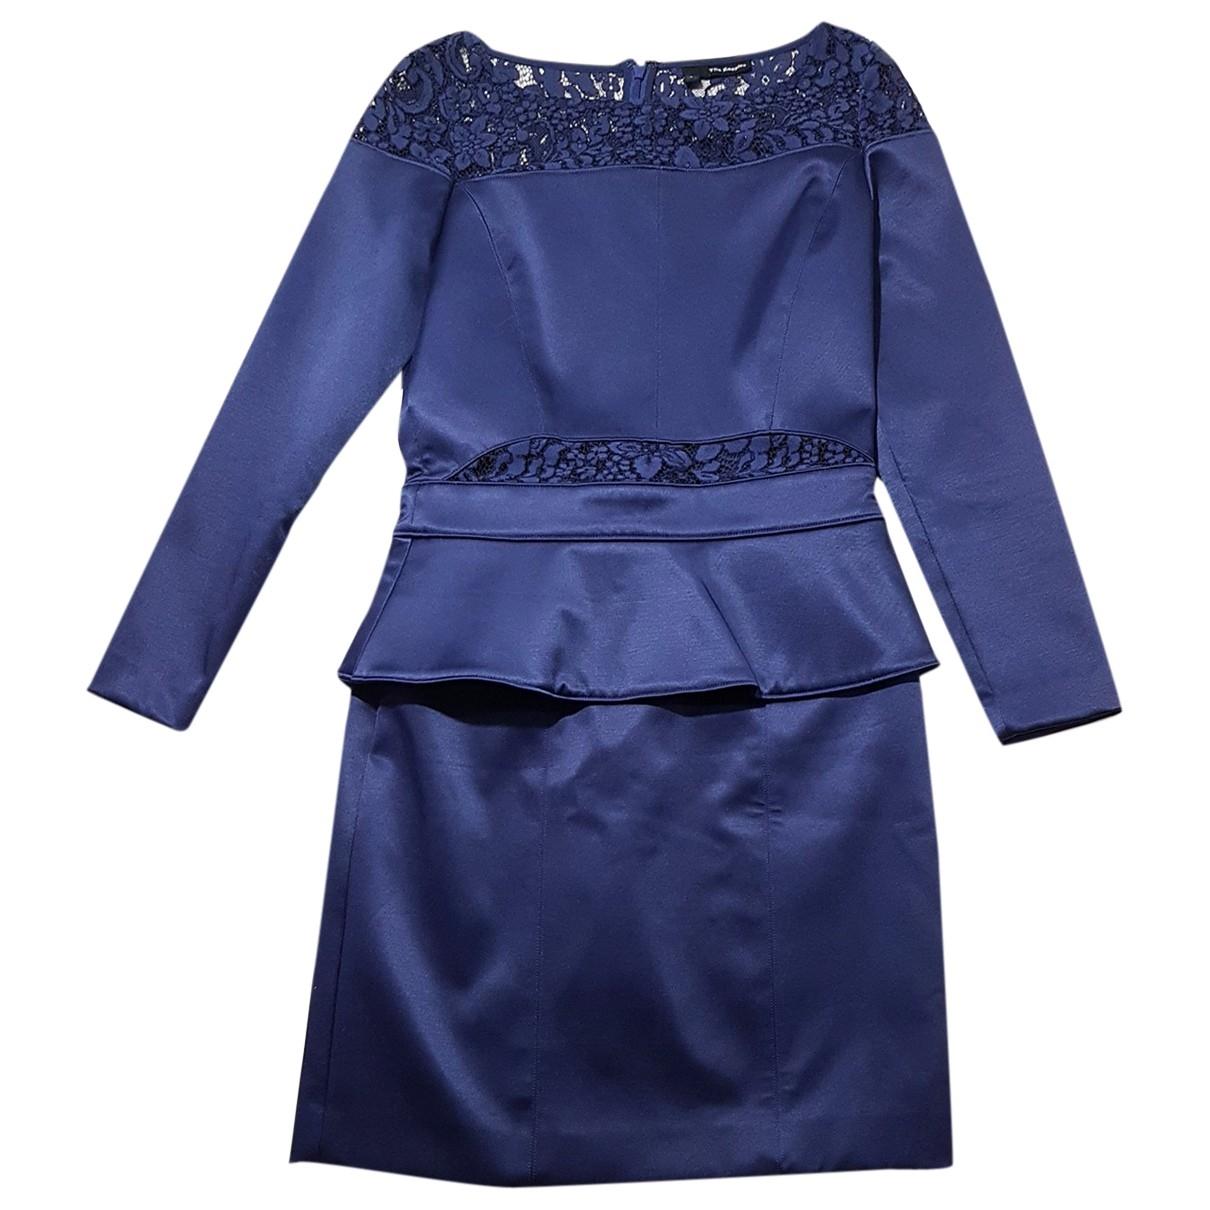 The Kooples \N Blue Cotton dress for Women S International